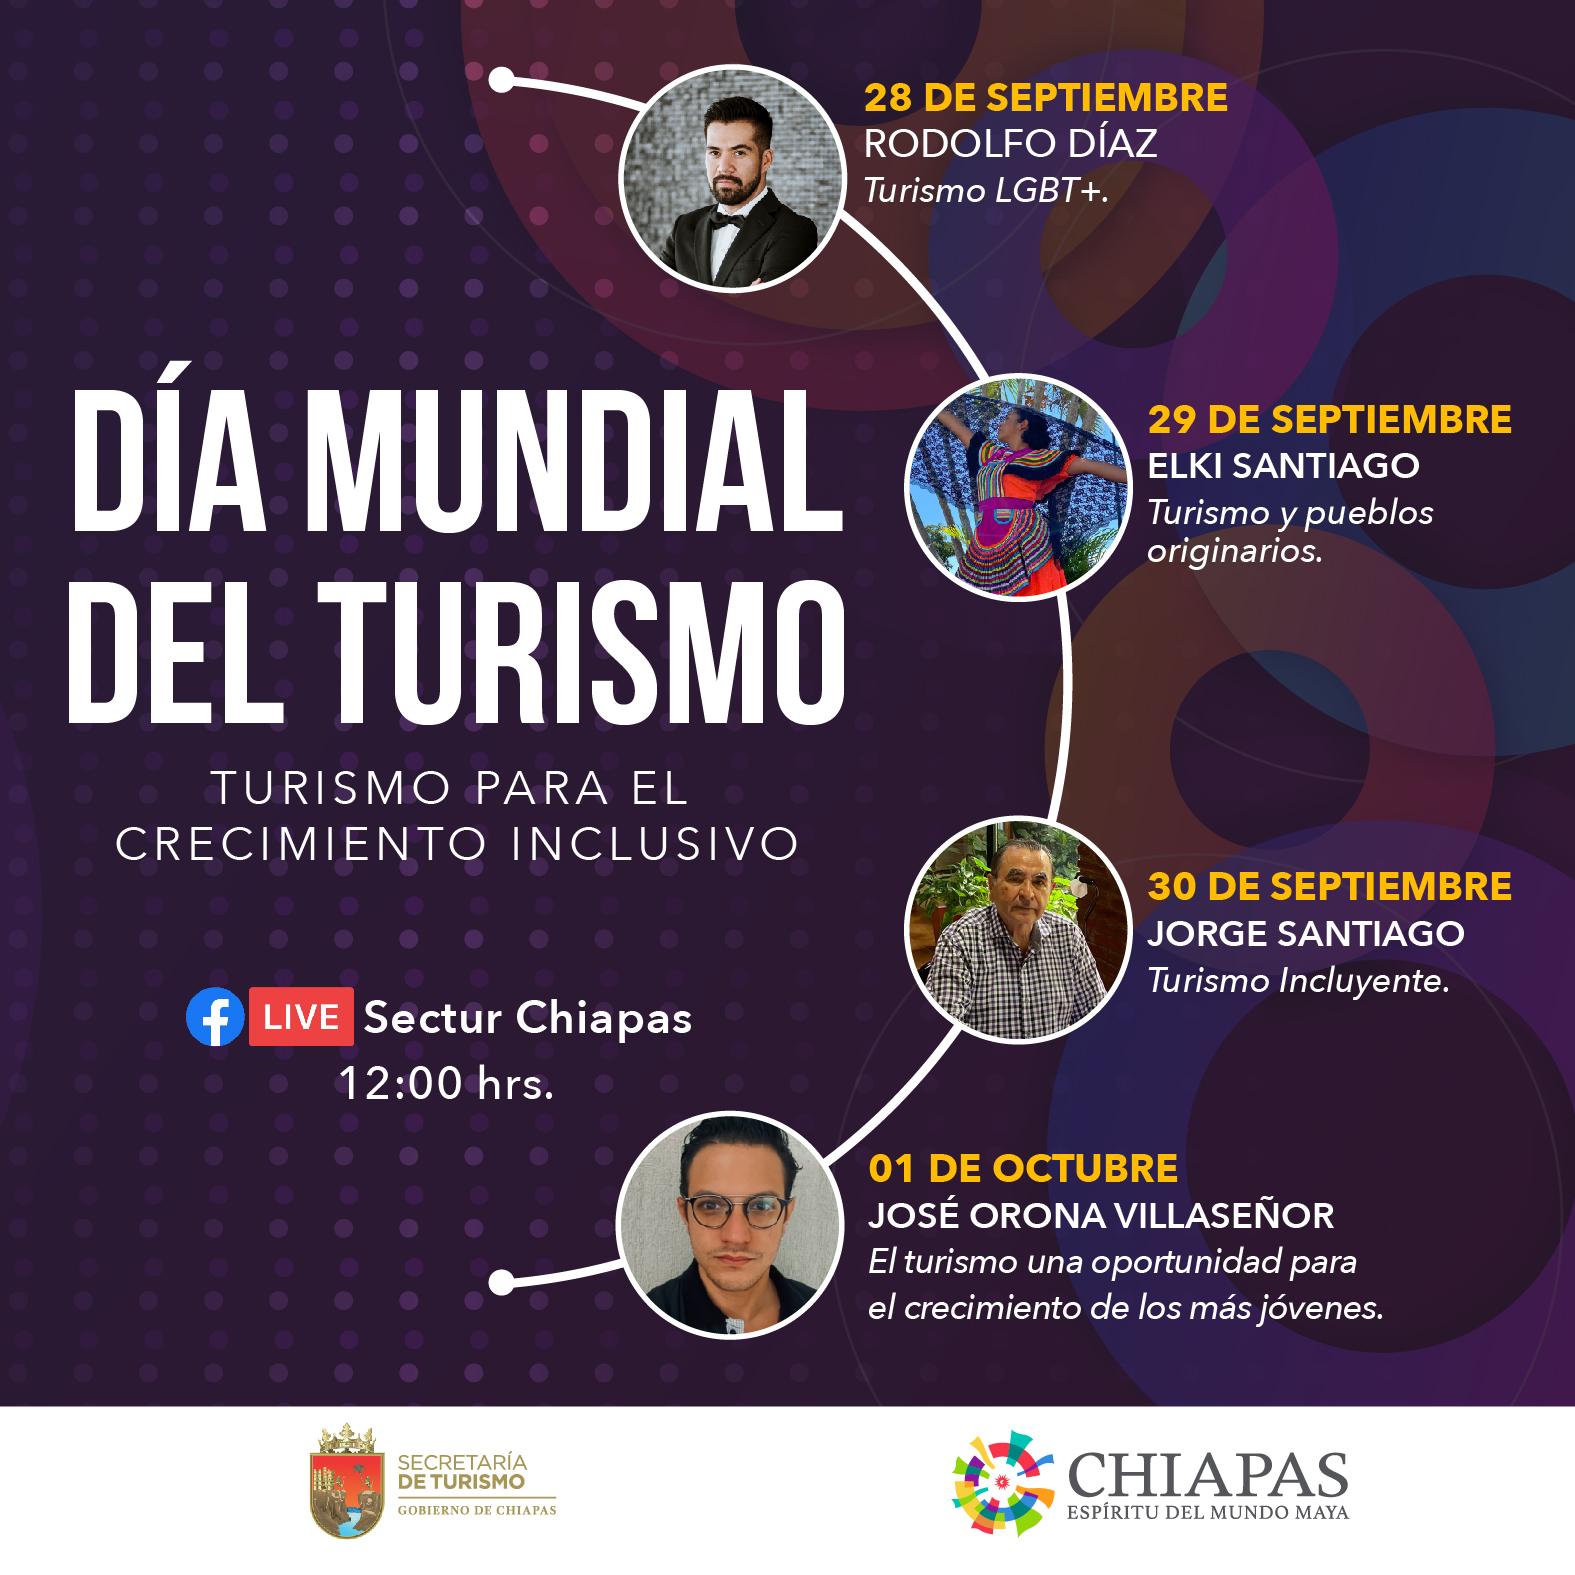 Tuxtla Gutiérrez, Chiapas, México